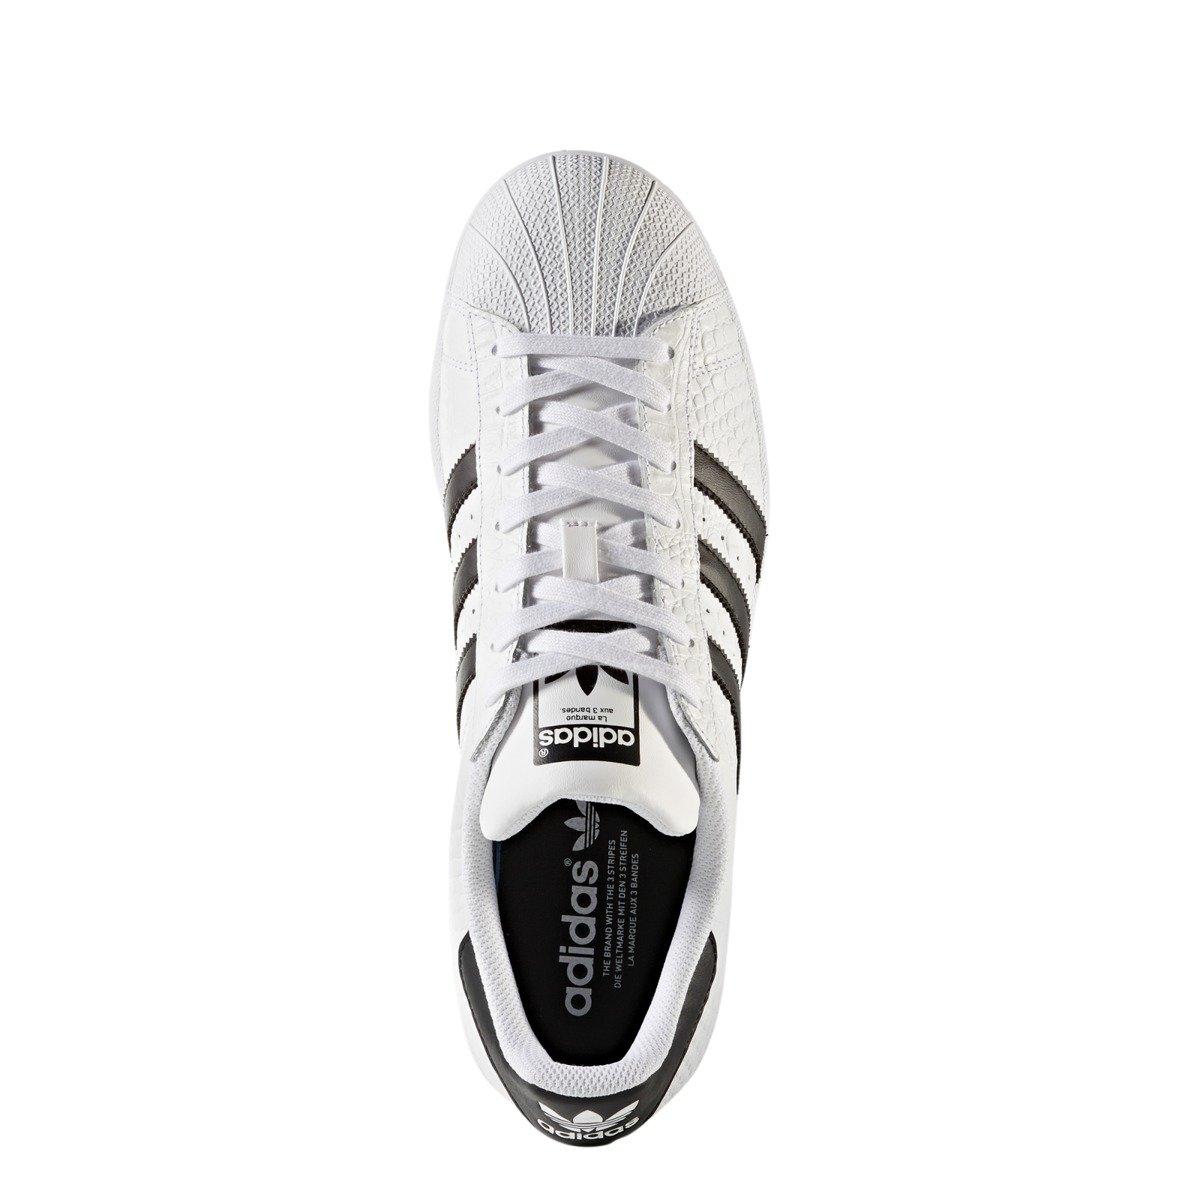 84ef0769d19d ... Adidas Originals Superstar Animal Print - BZ0198 Clicca per espandere  ...